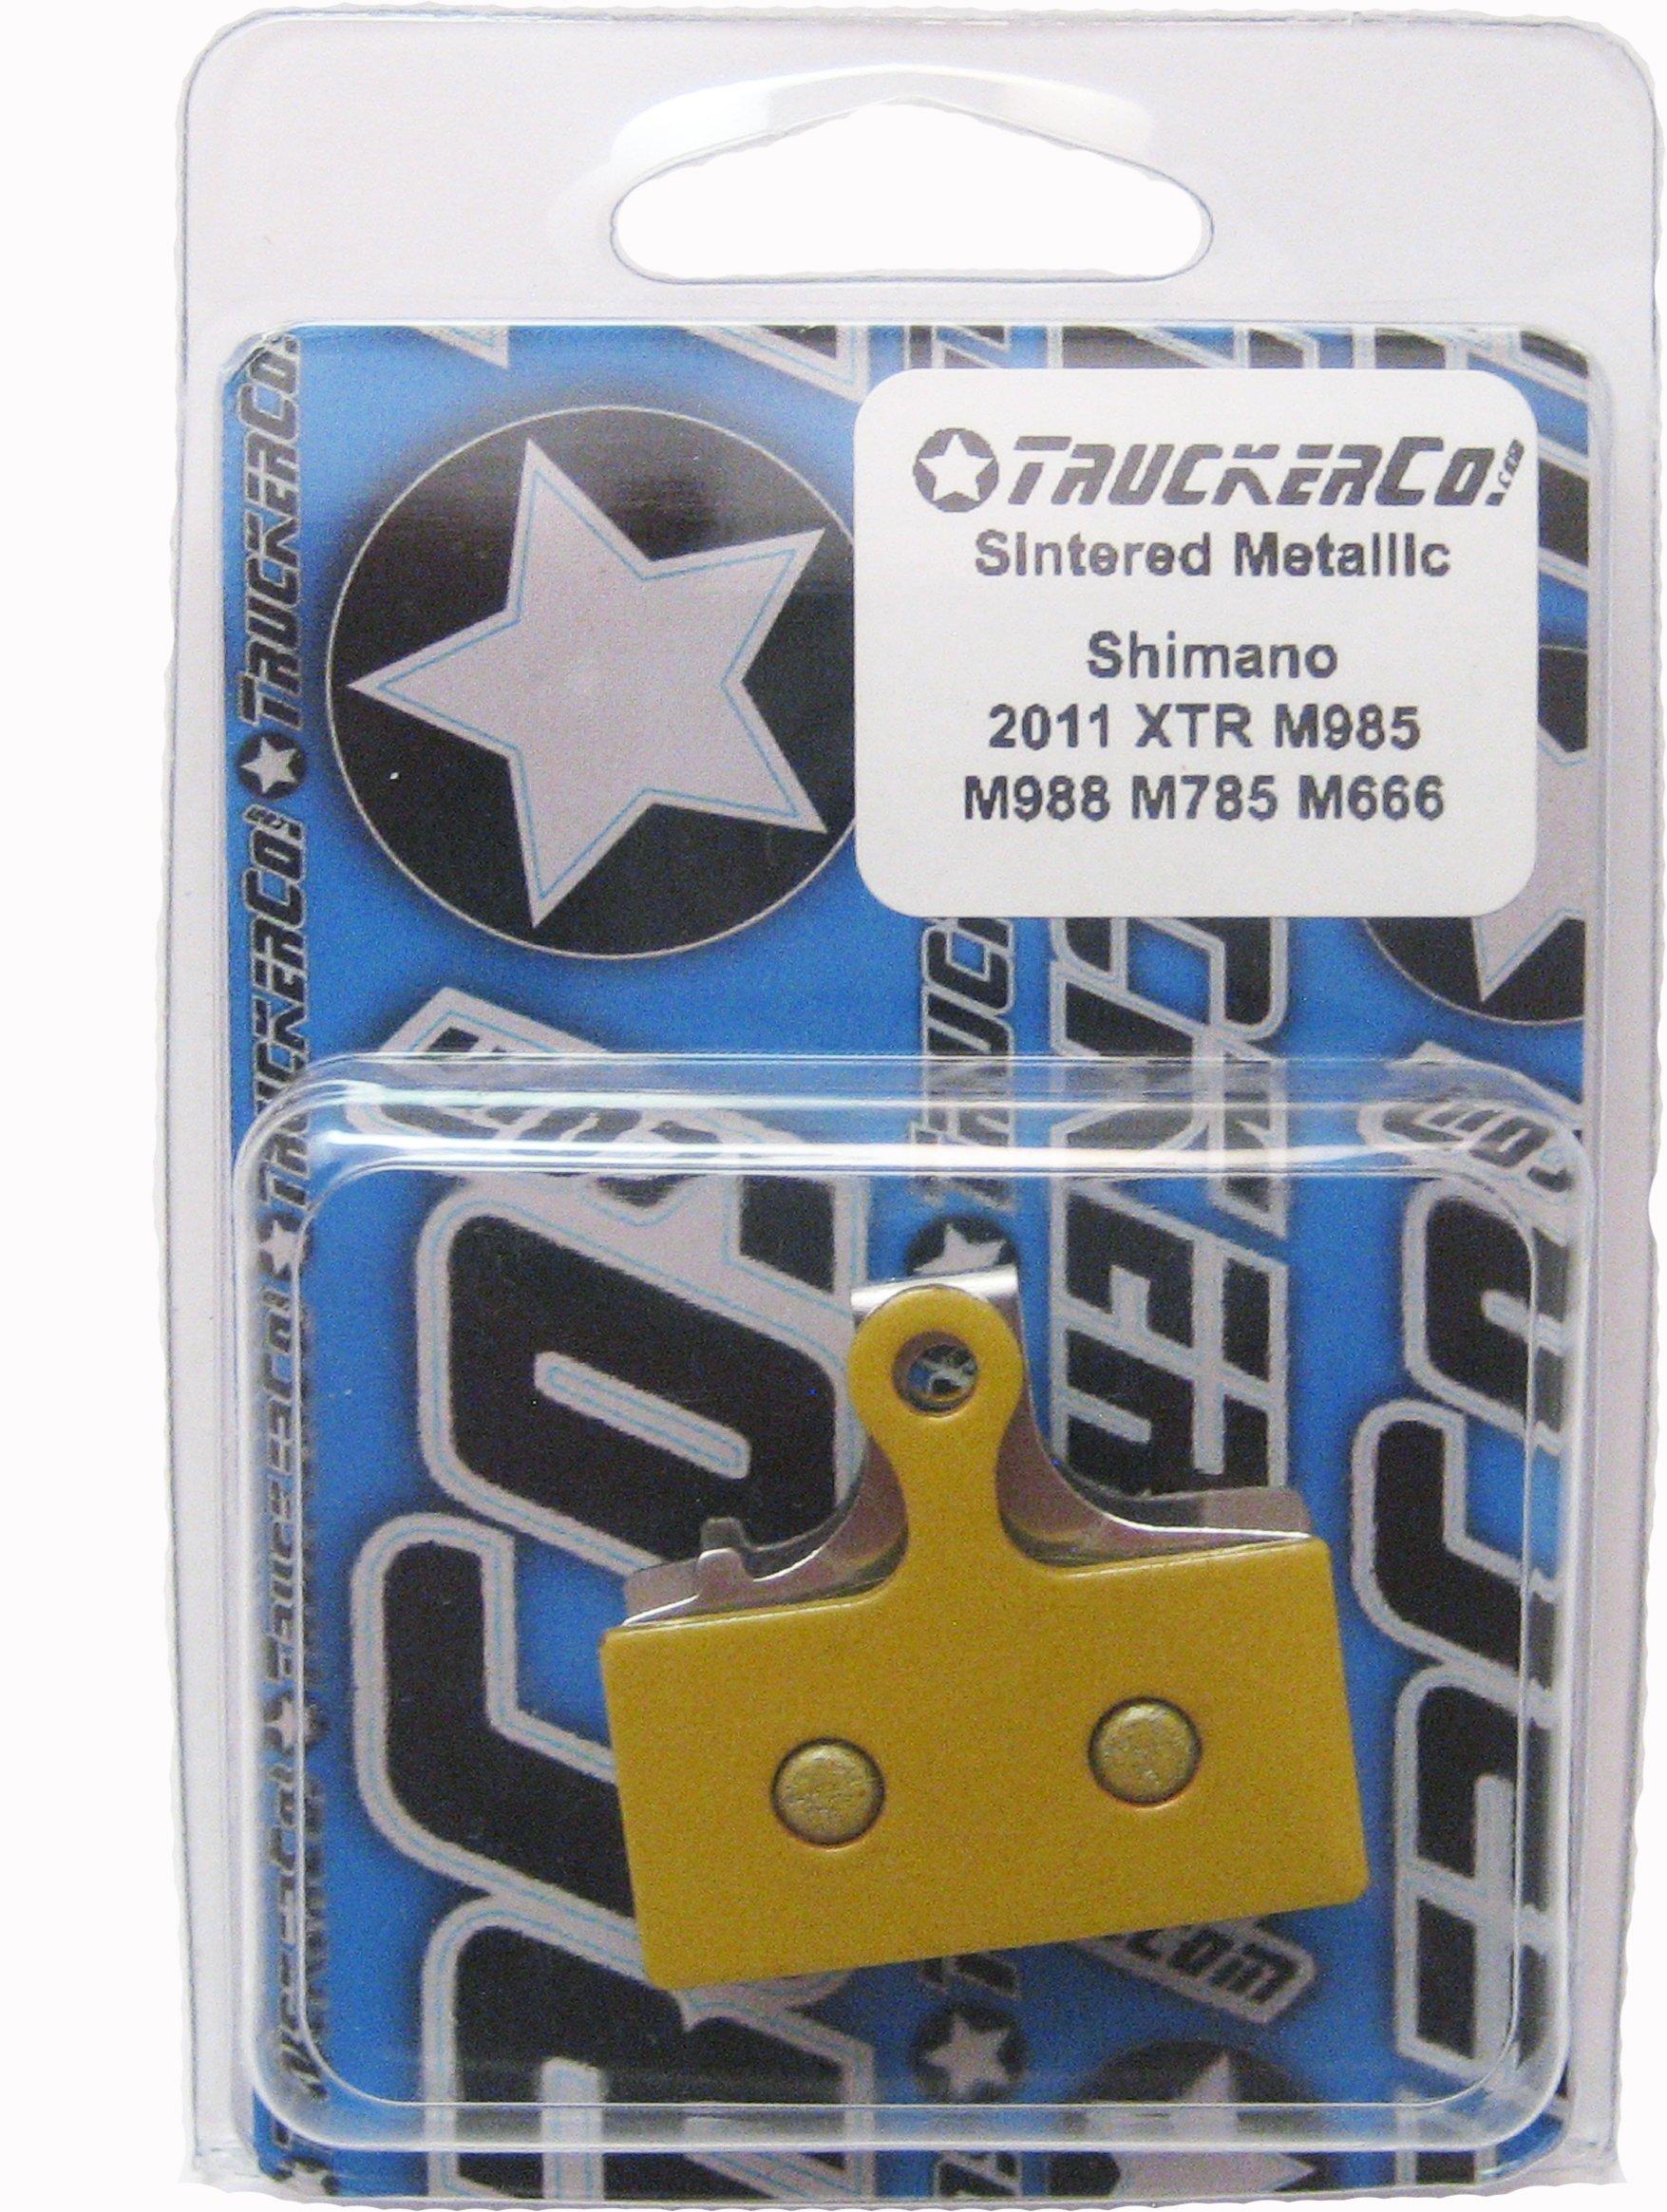 Sintered Metallic brake pads Shimano 2011-2015 XTR, XT, SLX, deore, BR-M9020 trail, BR-M9000 race, BR-M987, BR-M985, BR-M988, BR-M785, RS785, R785, S700 alfine, RS685, BR-M675, BR-M666, BR-M615, BR-M610, Di2 Ultegra Road Disc and CX, F01A, F03C, G01A, G03